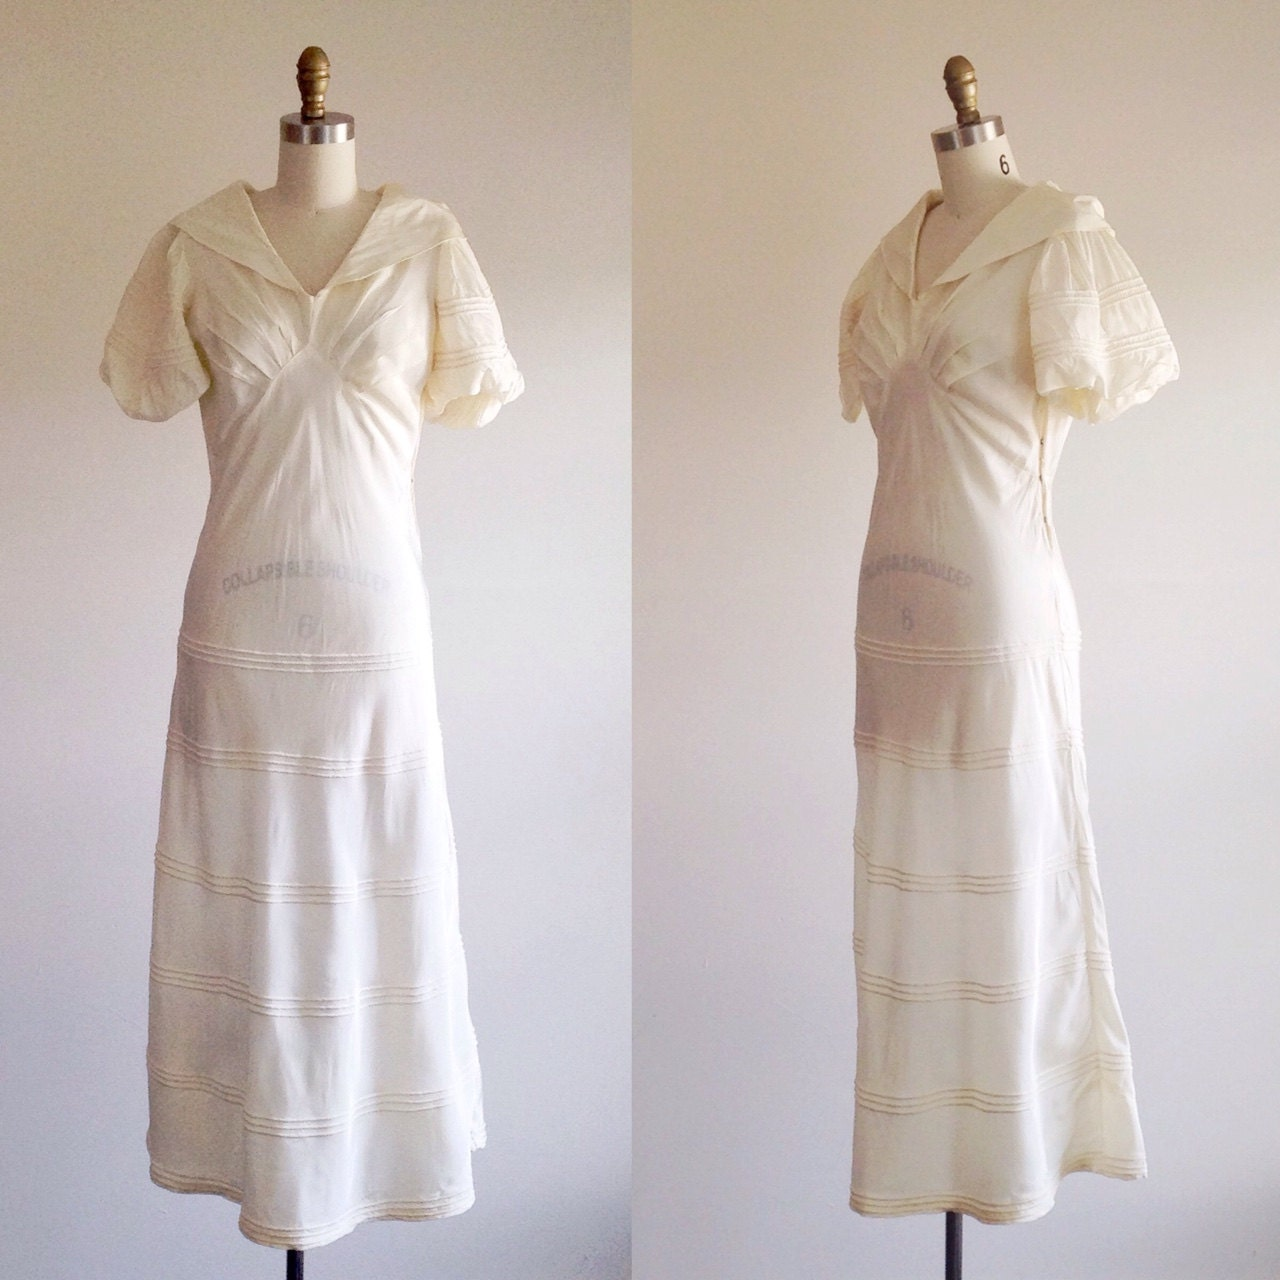 Simple wedding dress ivory wedding dress 1930s wedding for Simple ivory wedding dresses